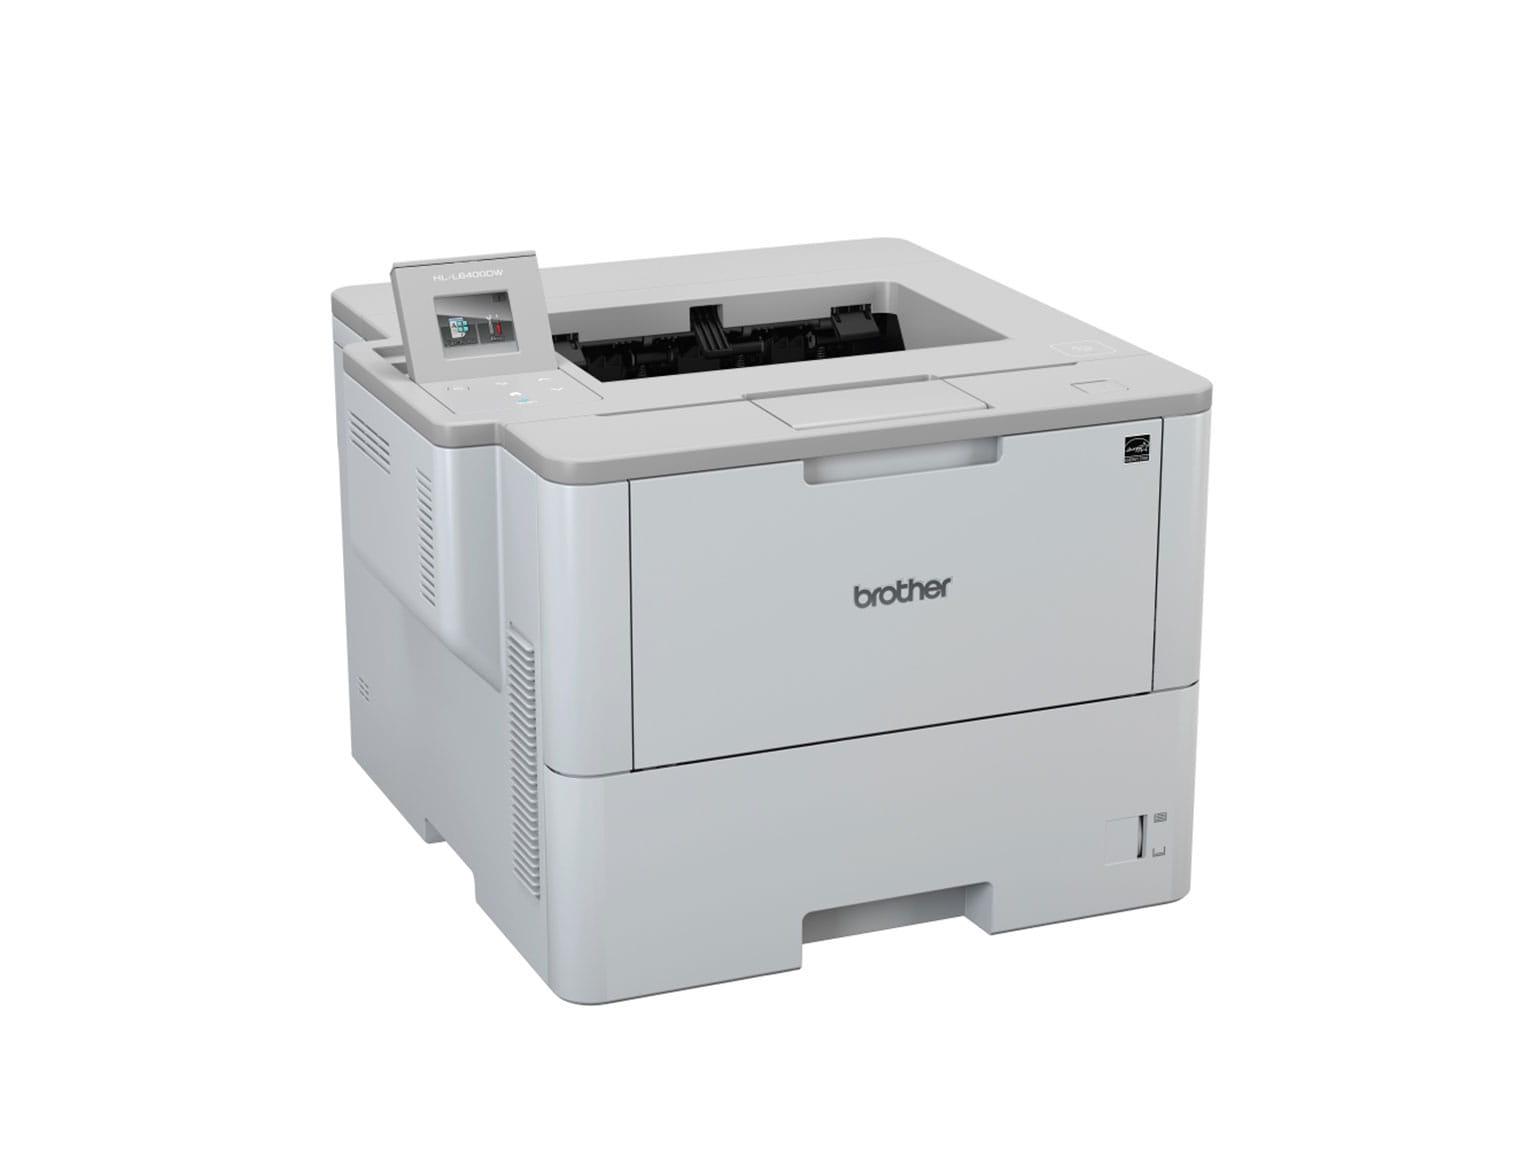 Brother mono laser printer 3/4 view